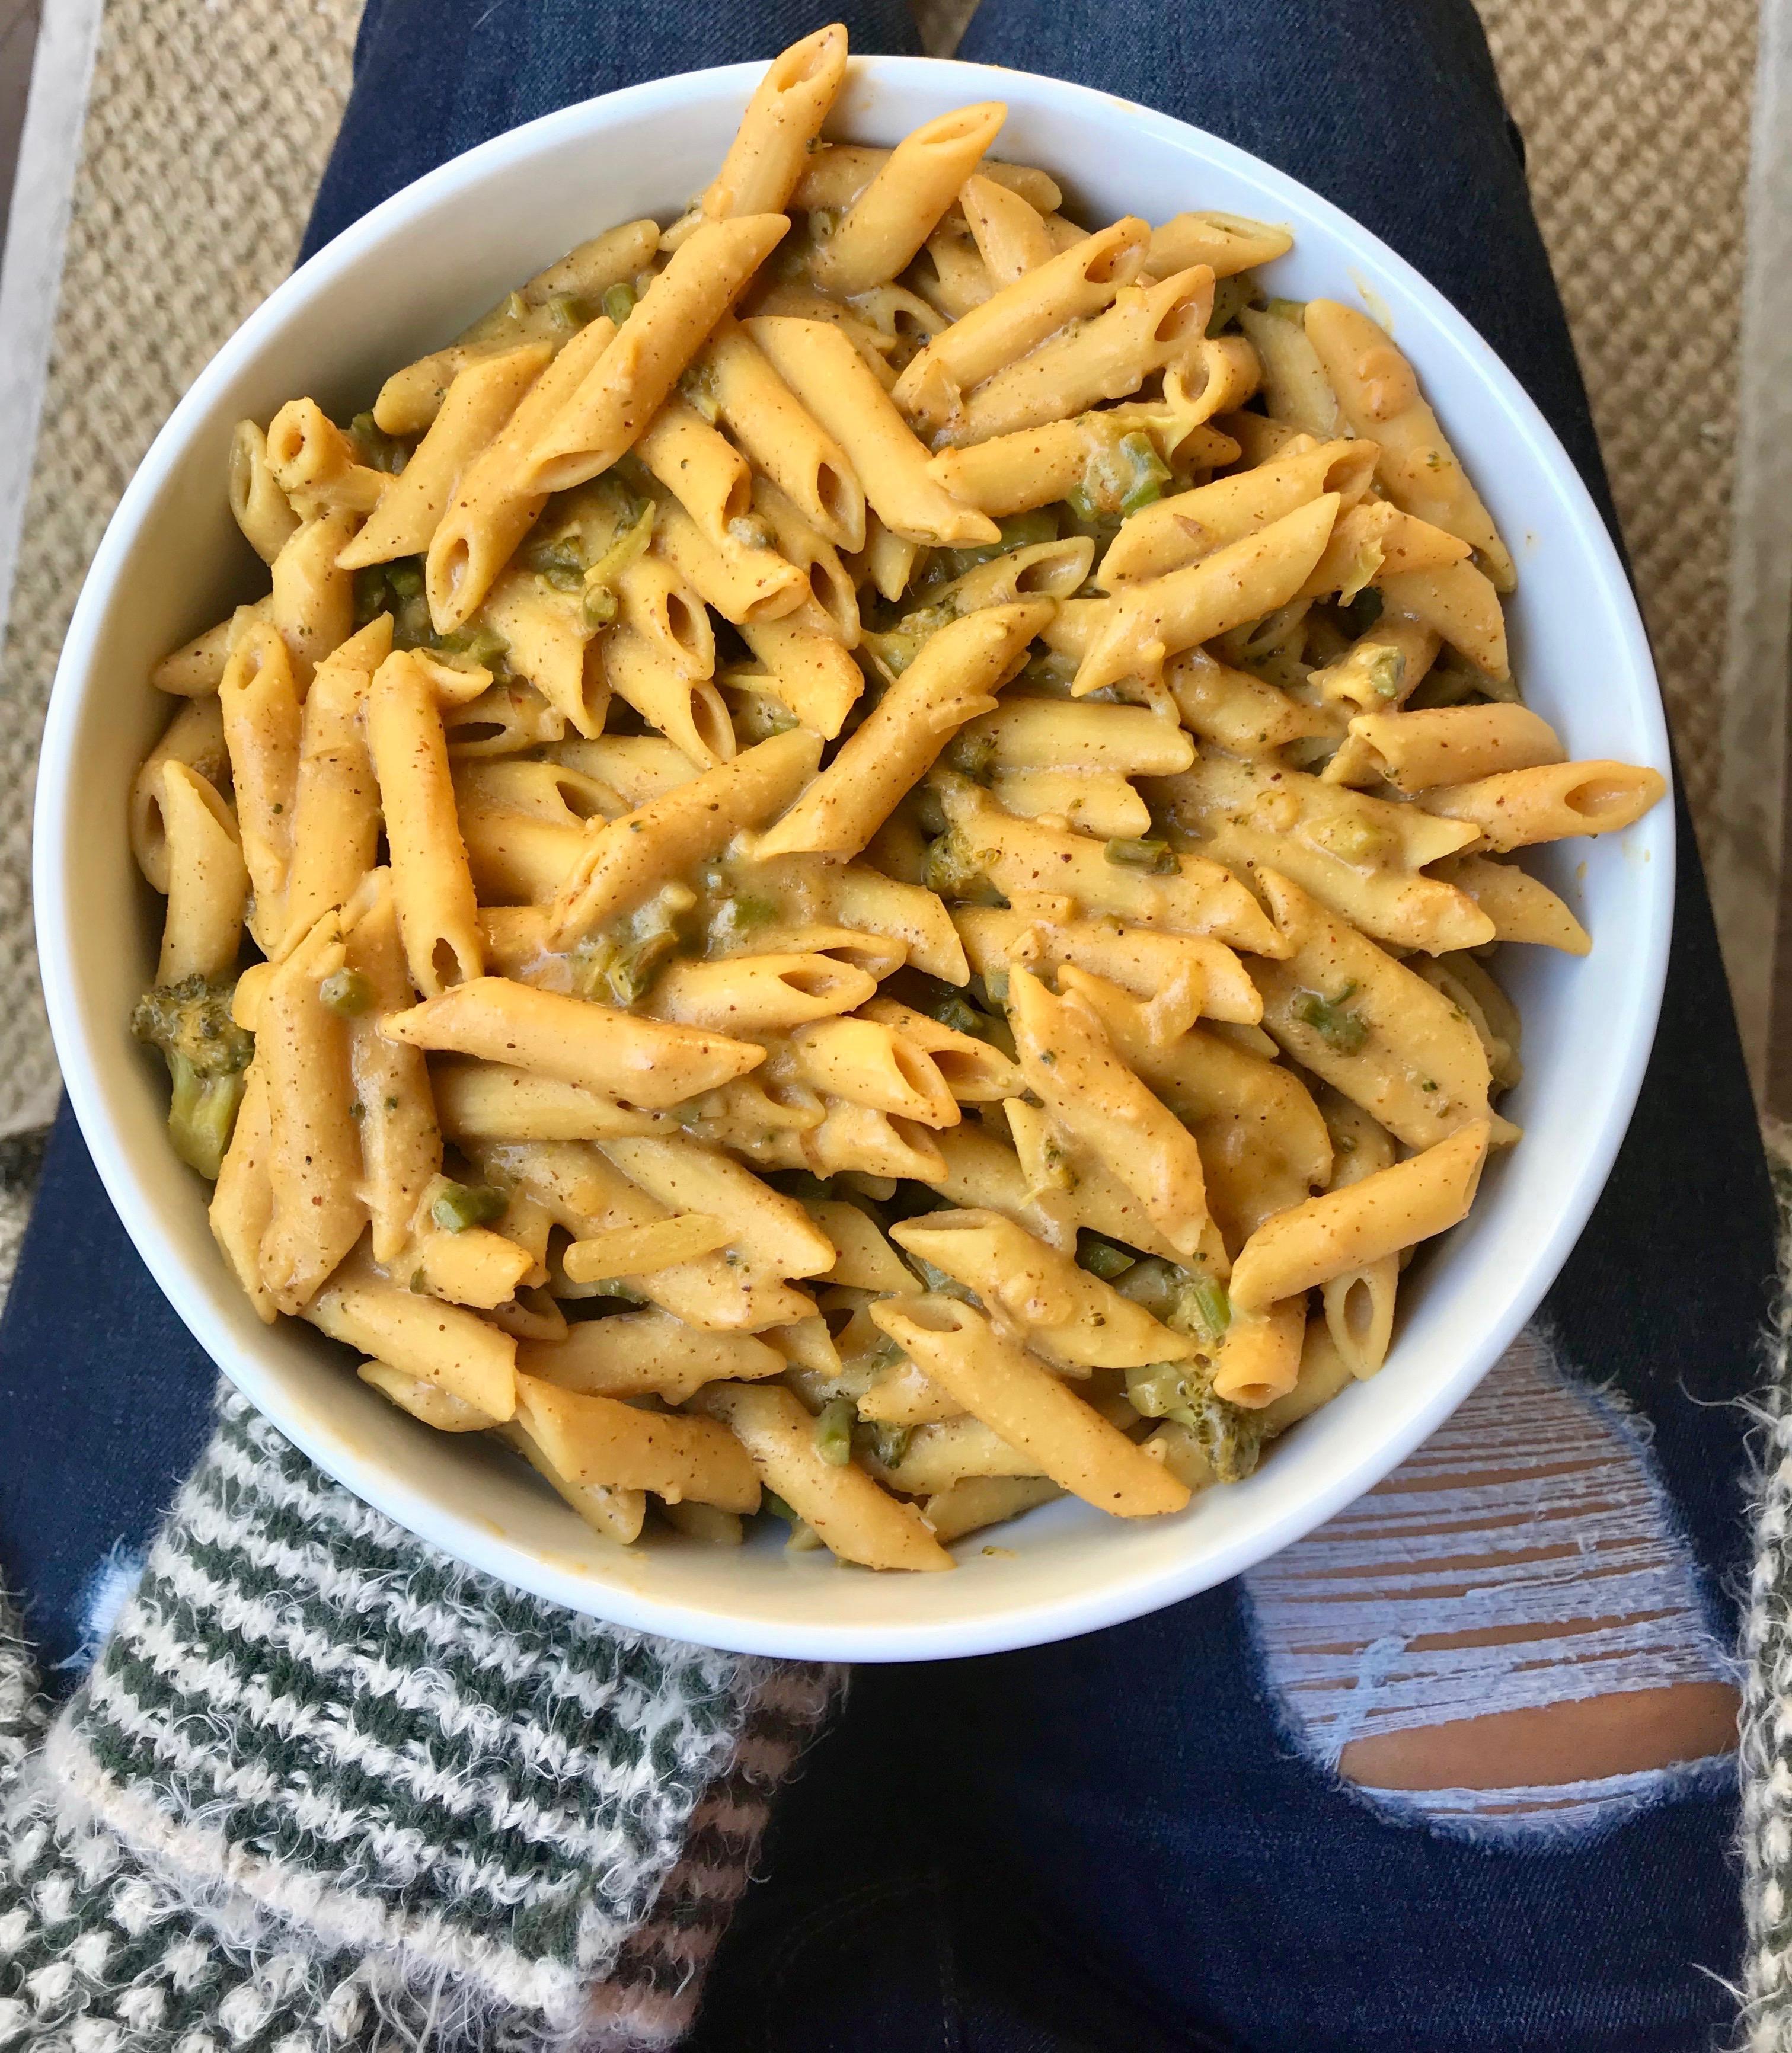 Broccoli Mac & Cheeze